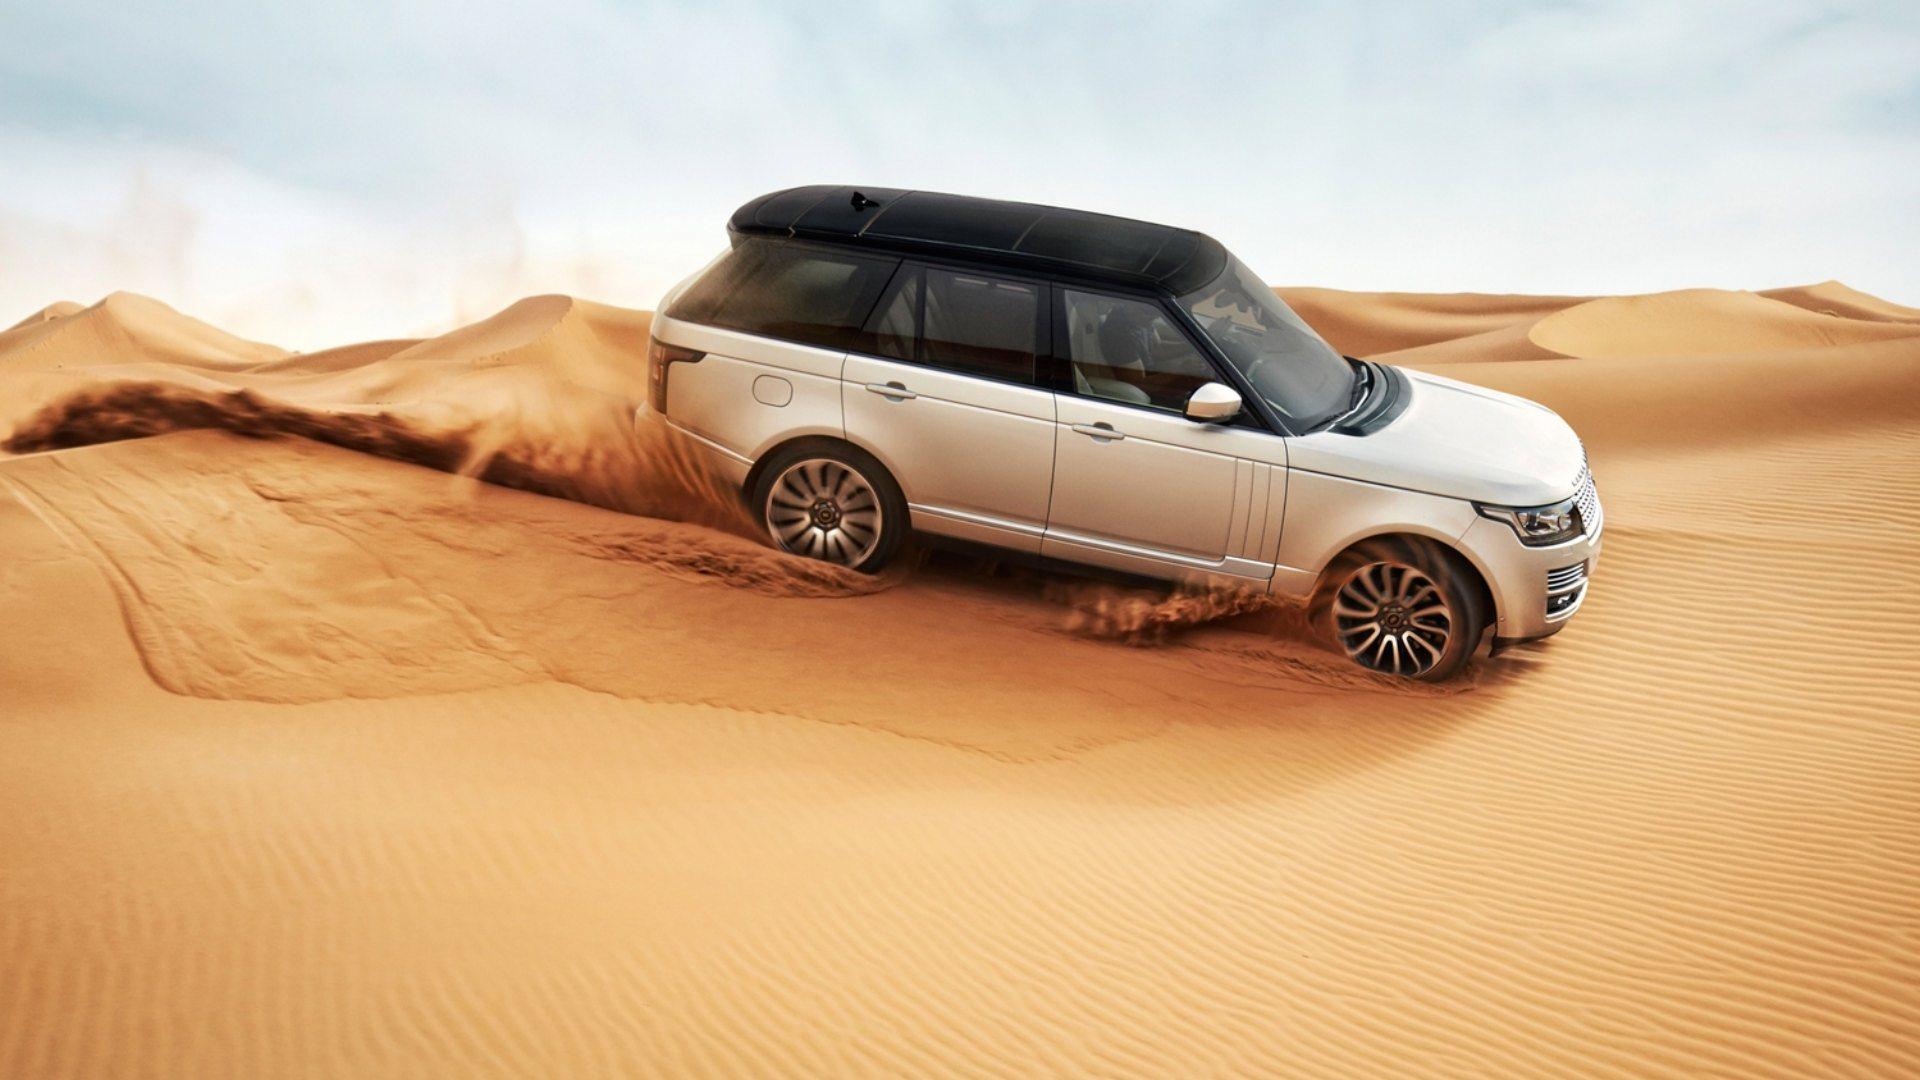 Wallpaper: 2013 Land Rover Range Rover Wallpapers